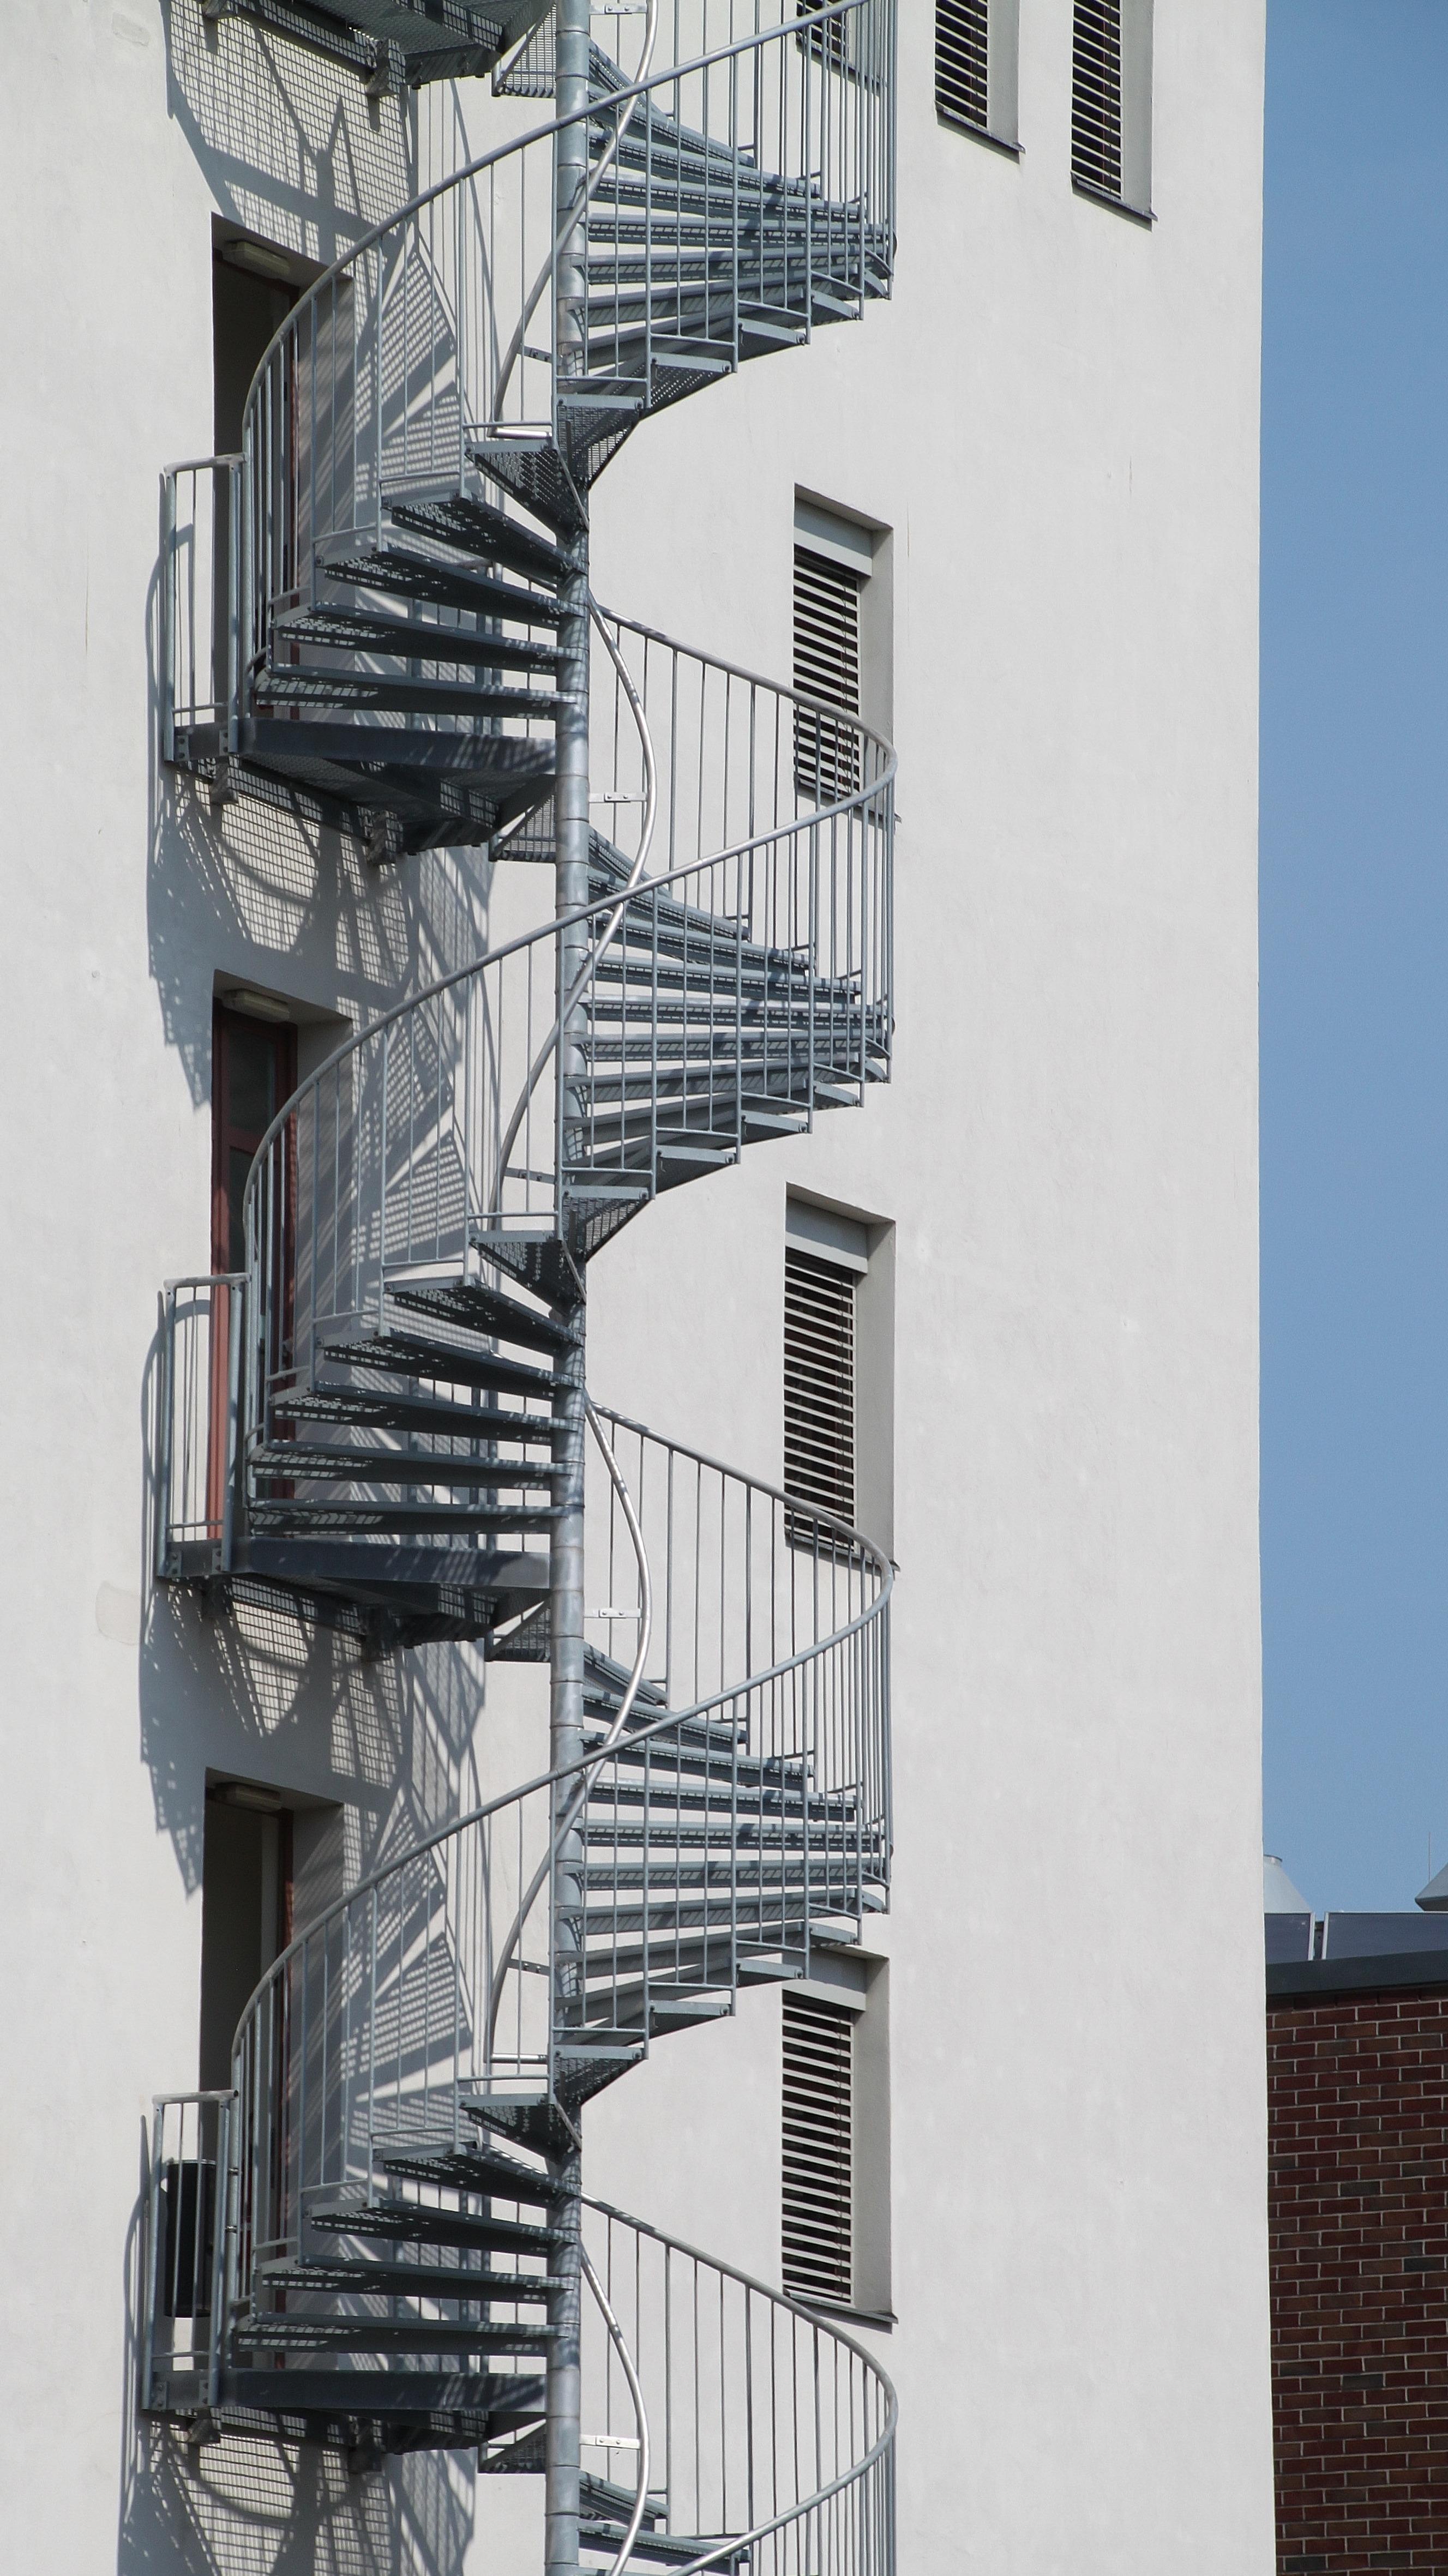 Gambar Arsitektur Jendela Bangunan Rumah Pencakar Langit